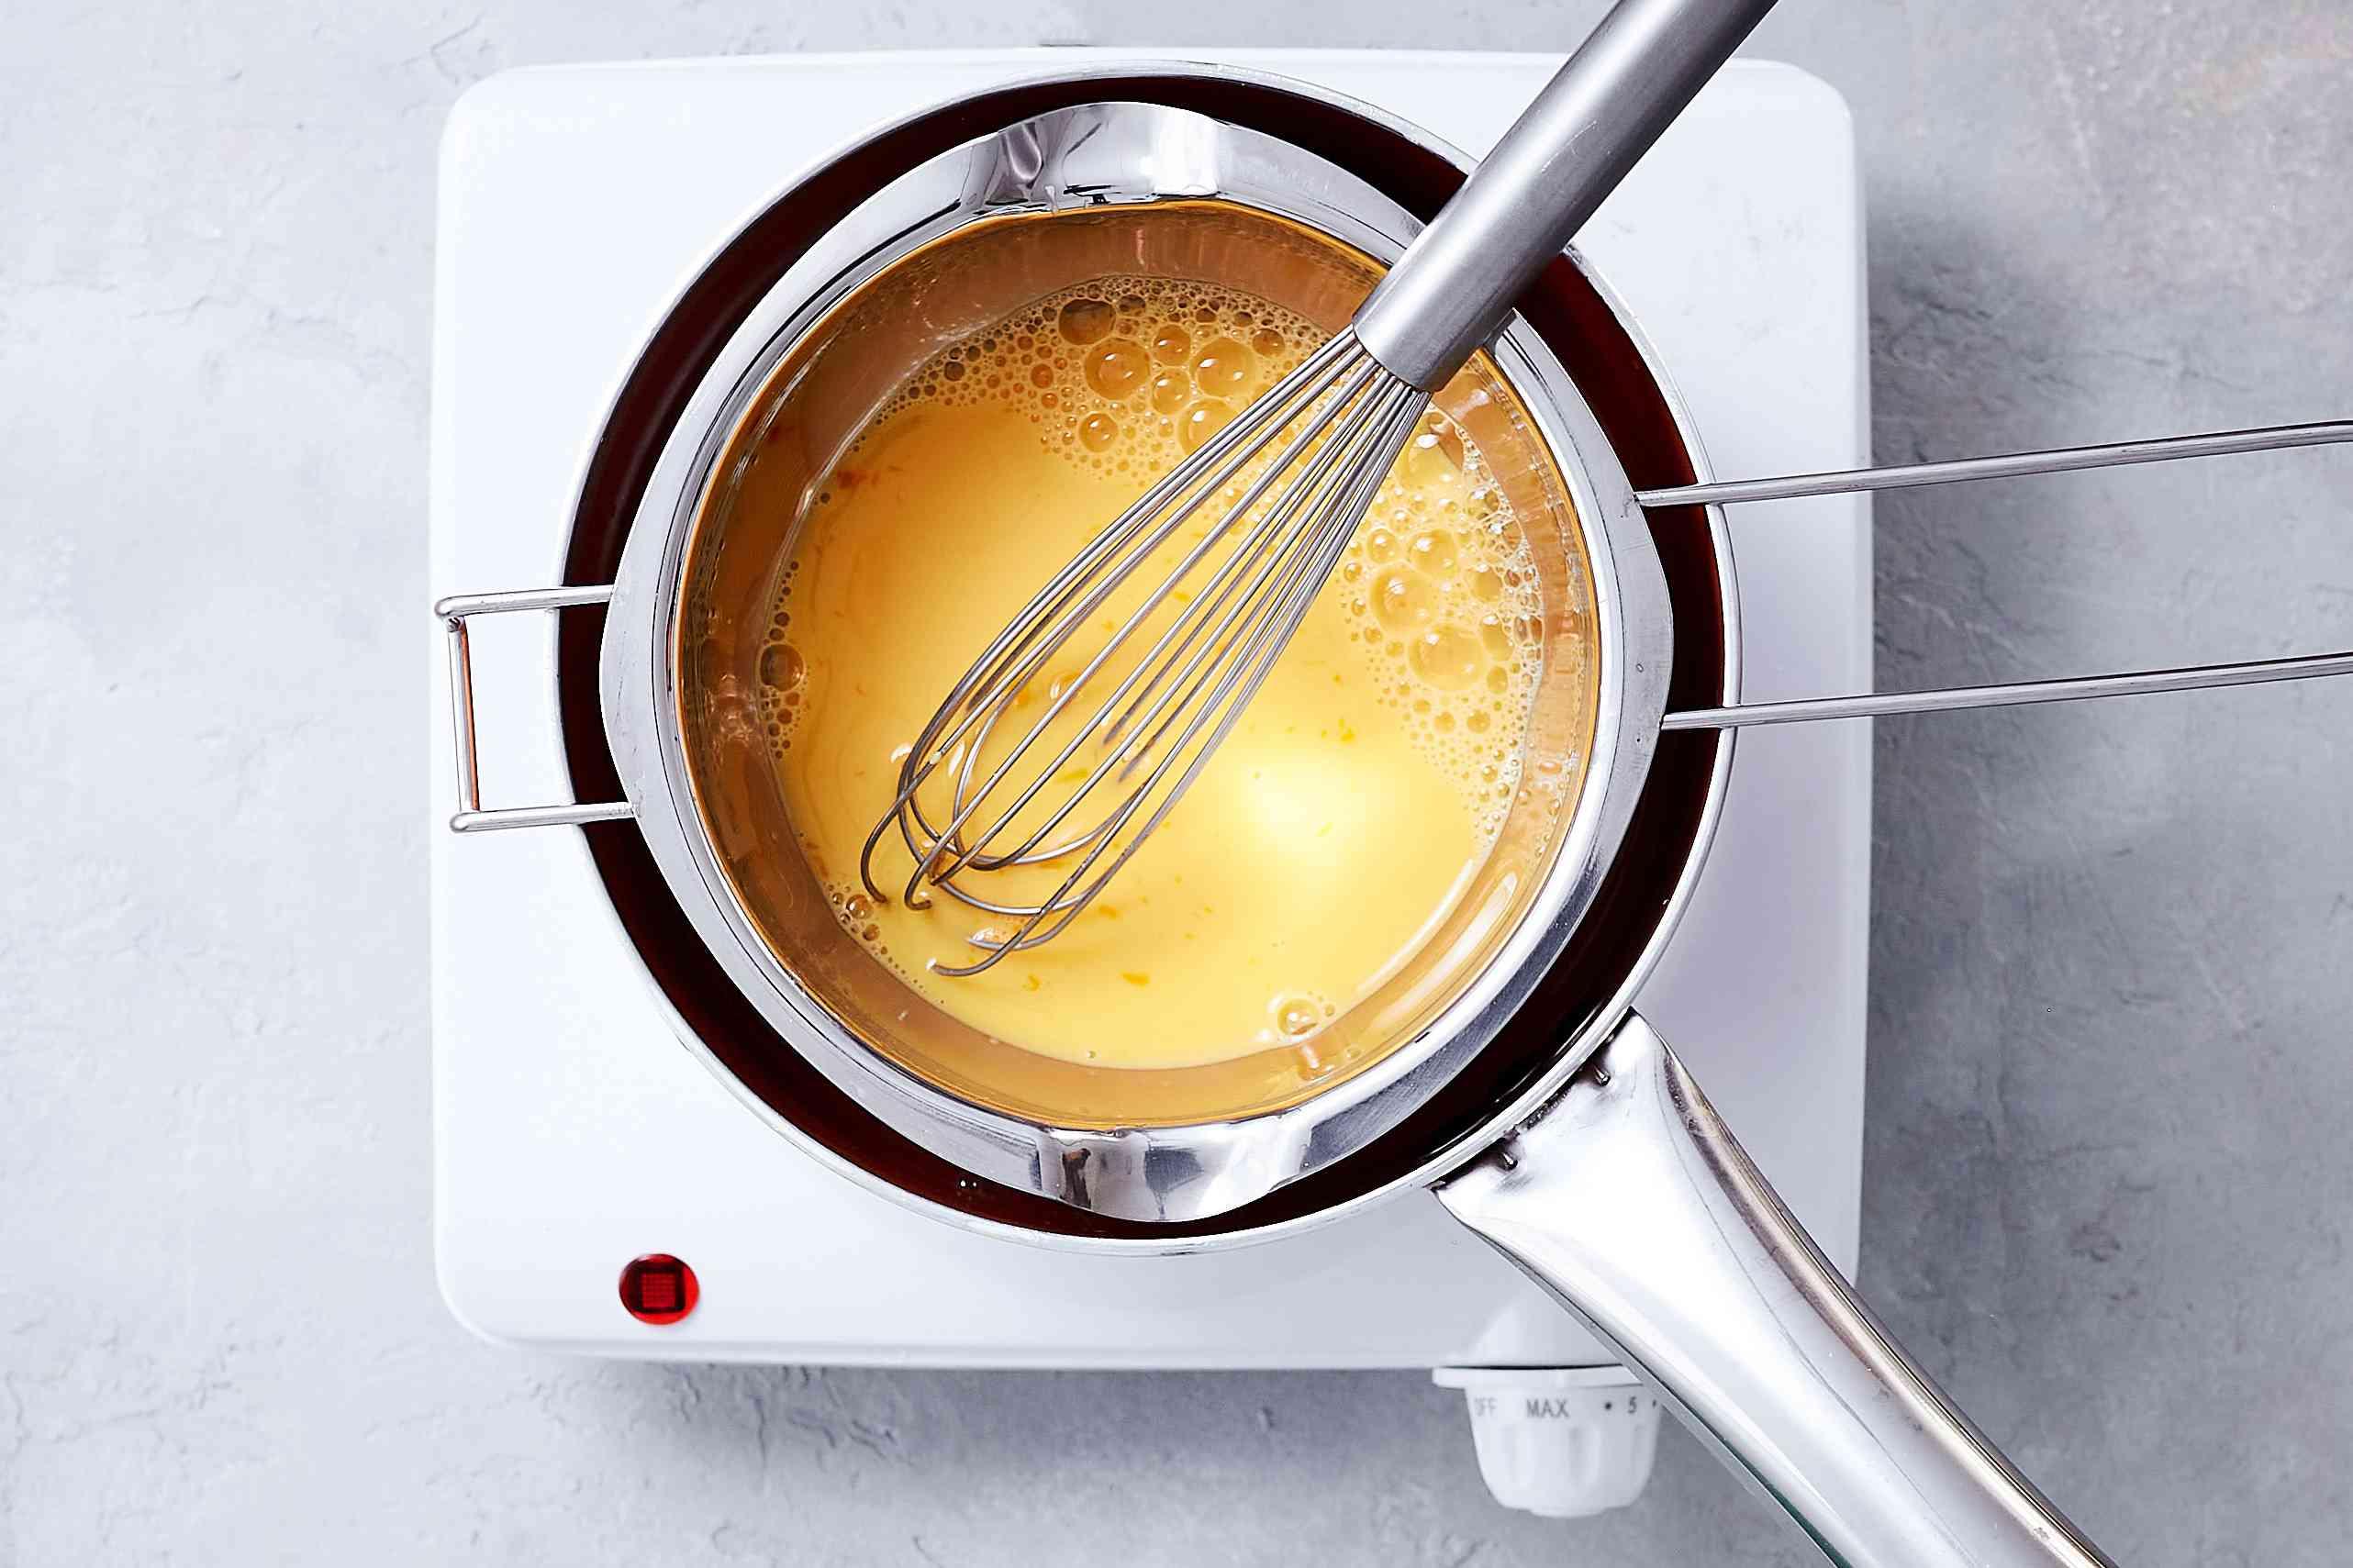 Whisk egg yolks into a double boiler